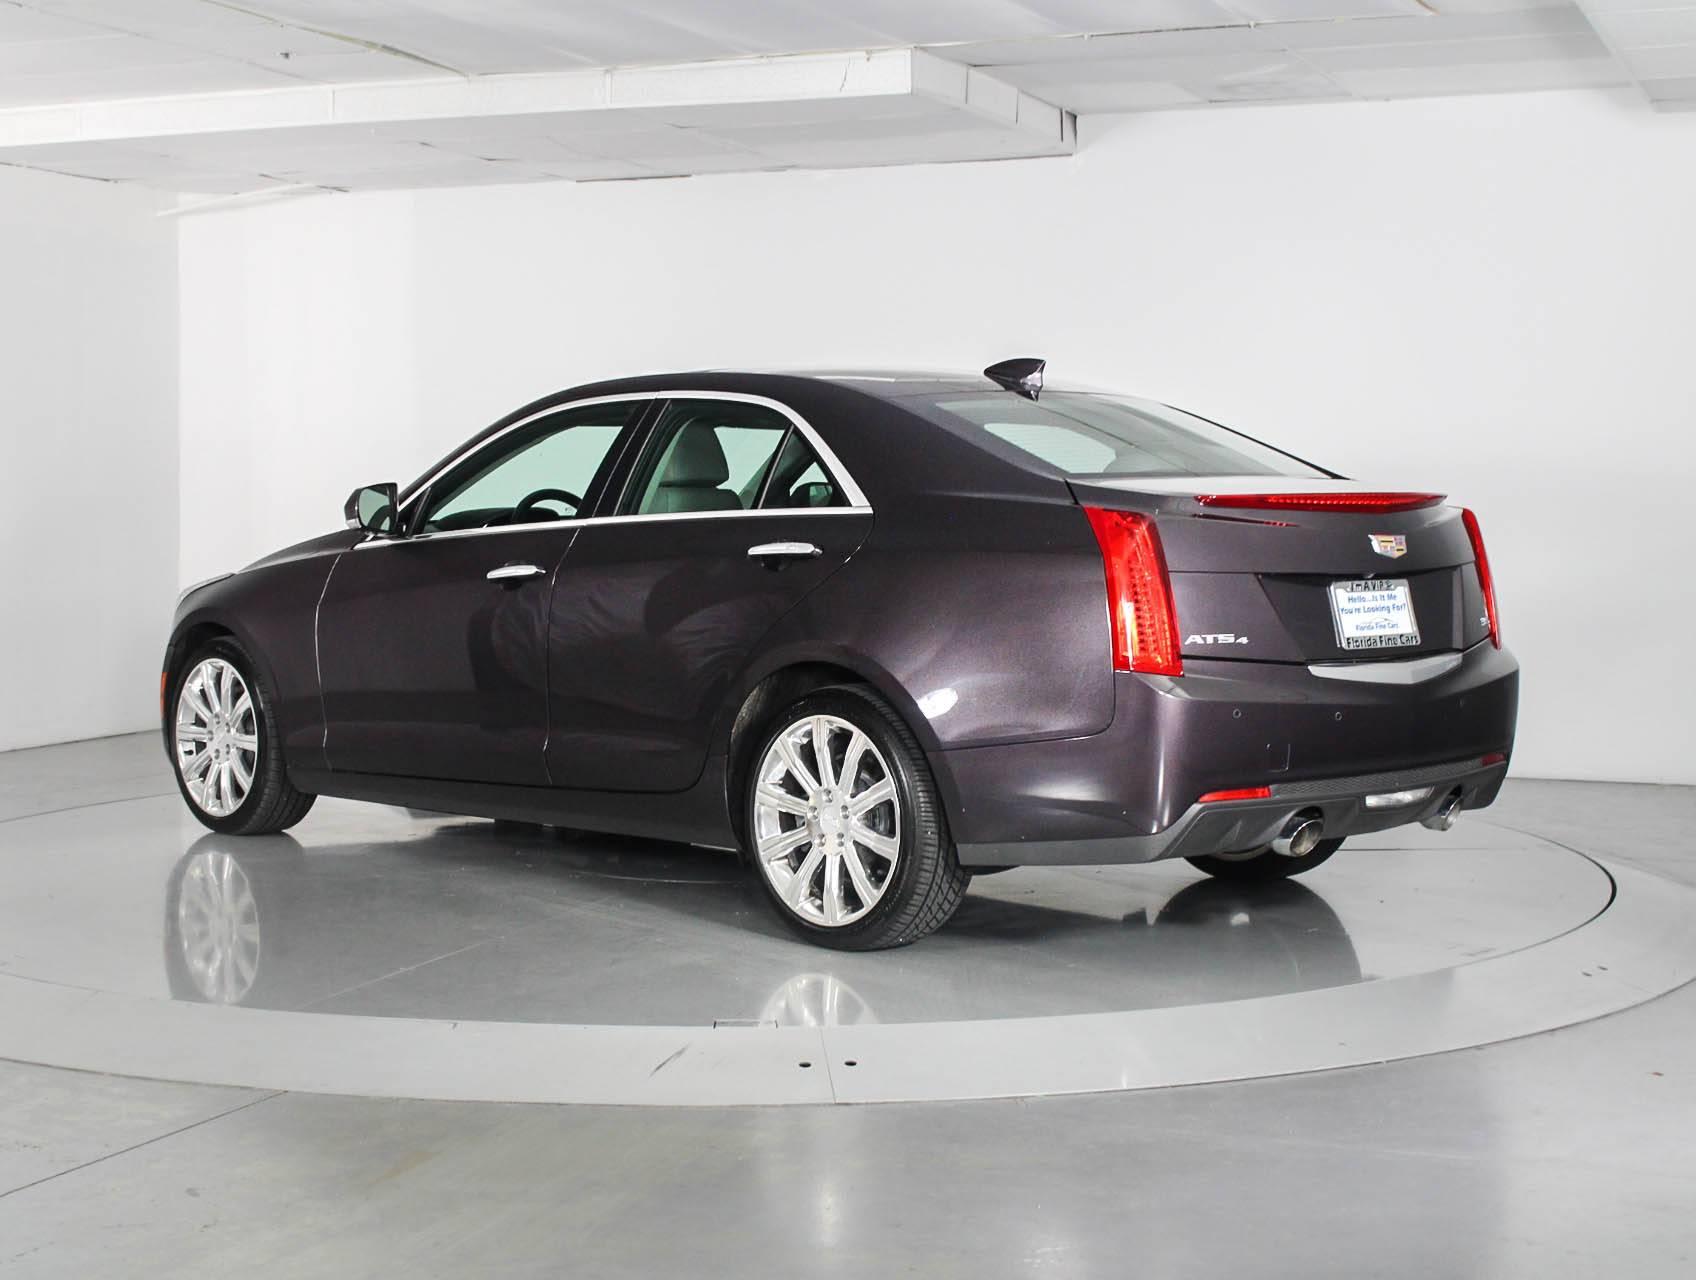 door inventory cadillac luxury awd sedan in certified ats used pre owned